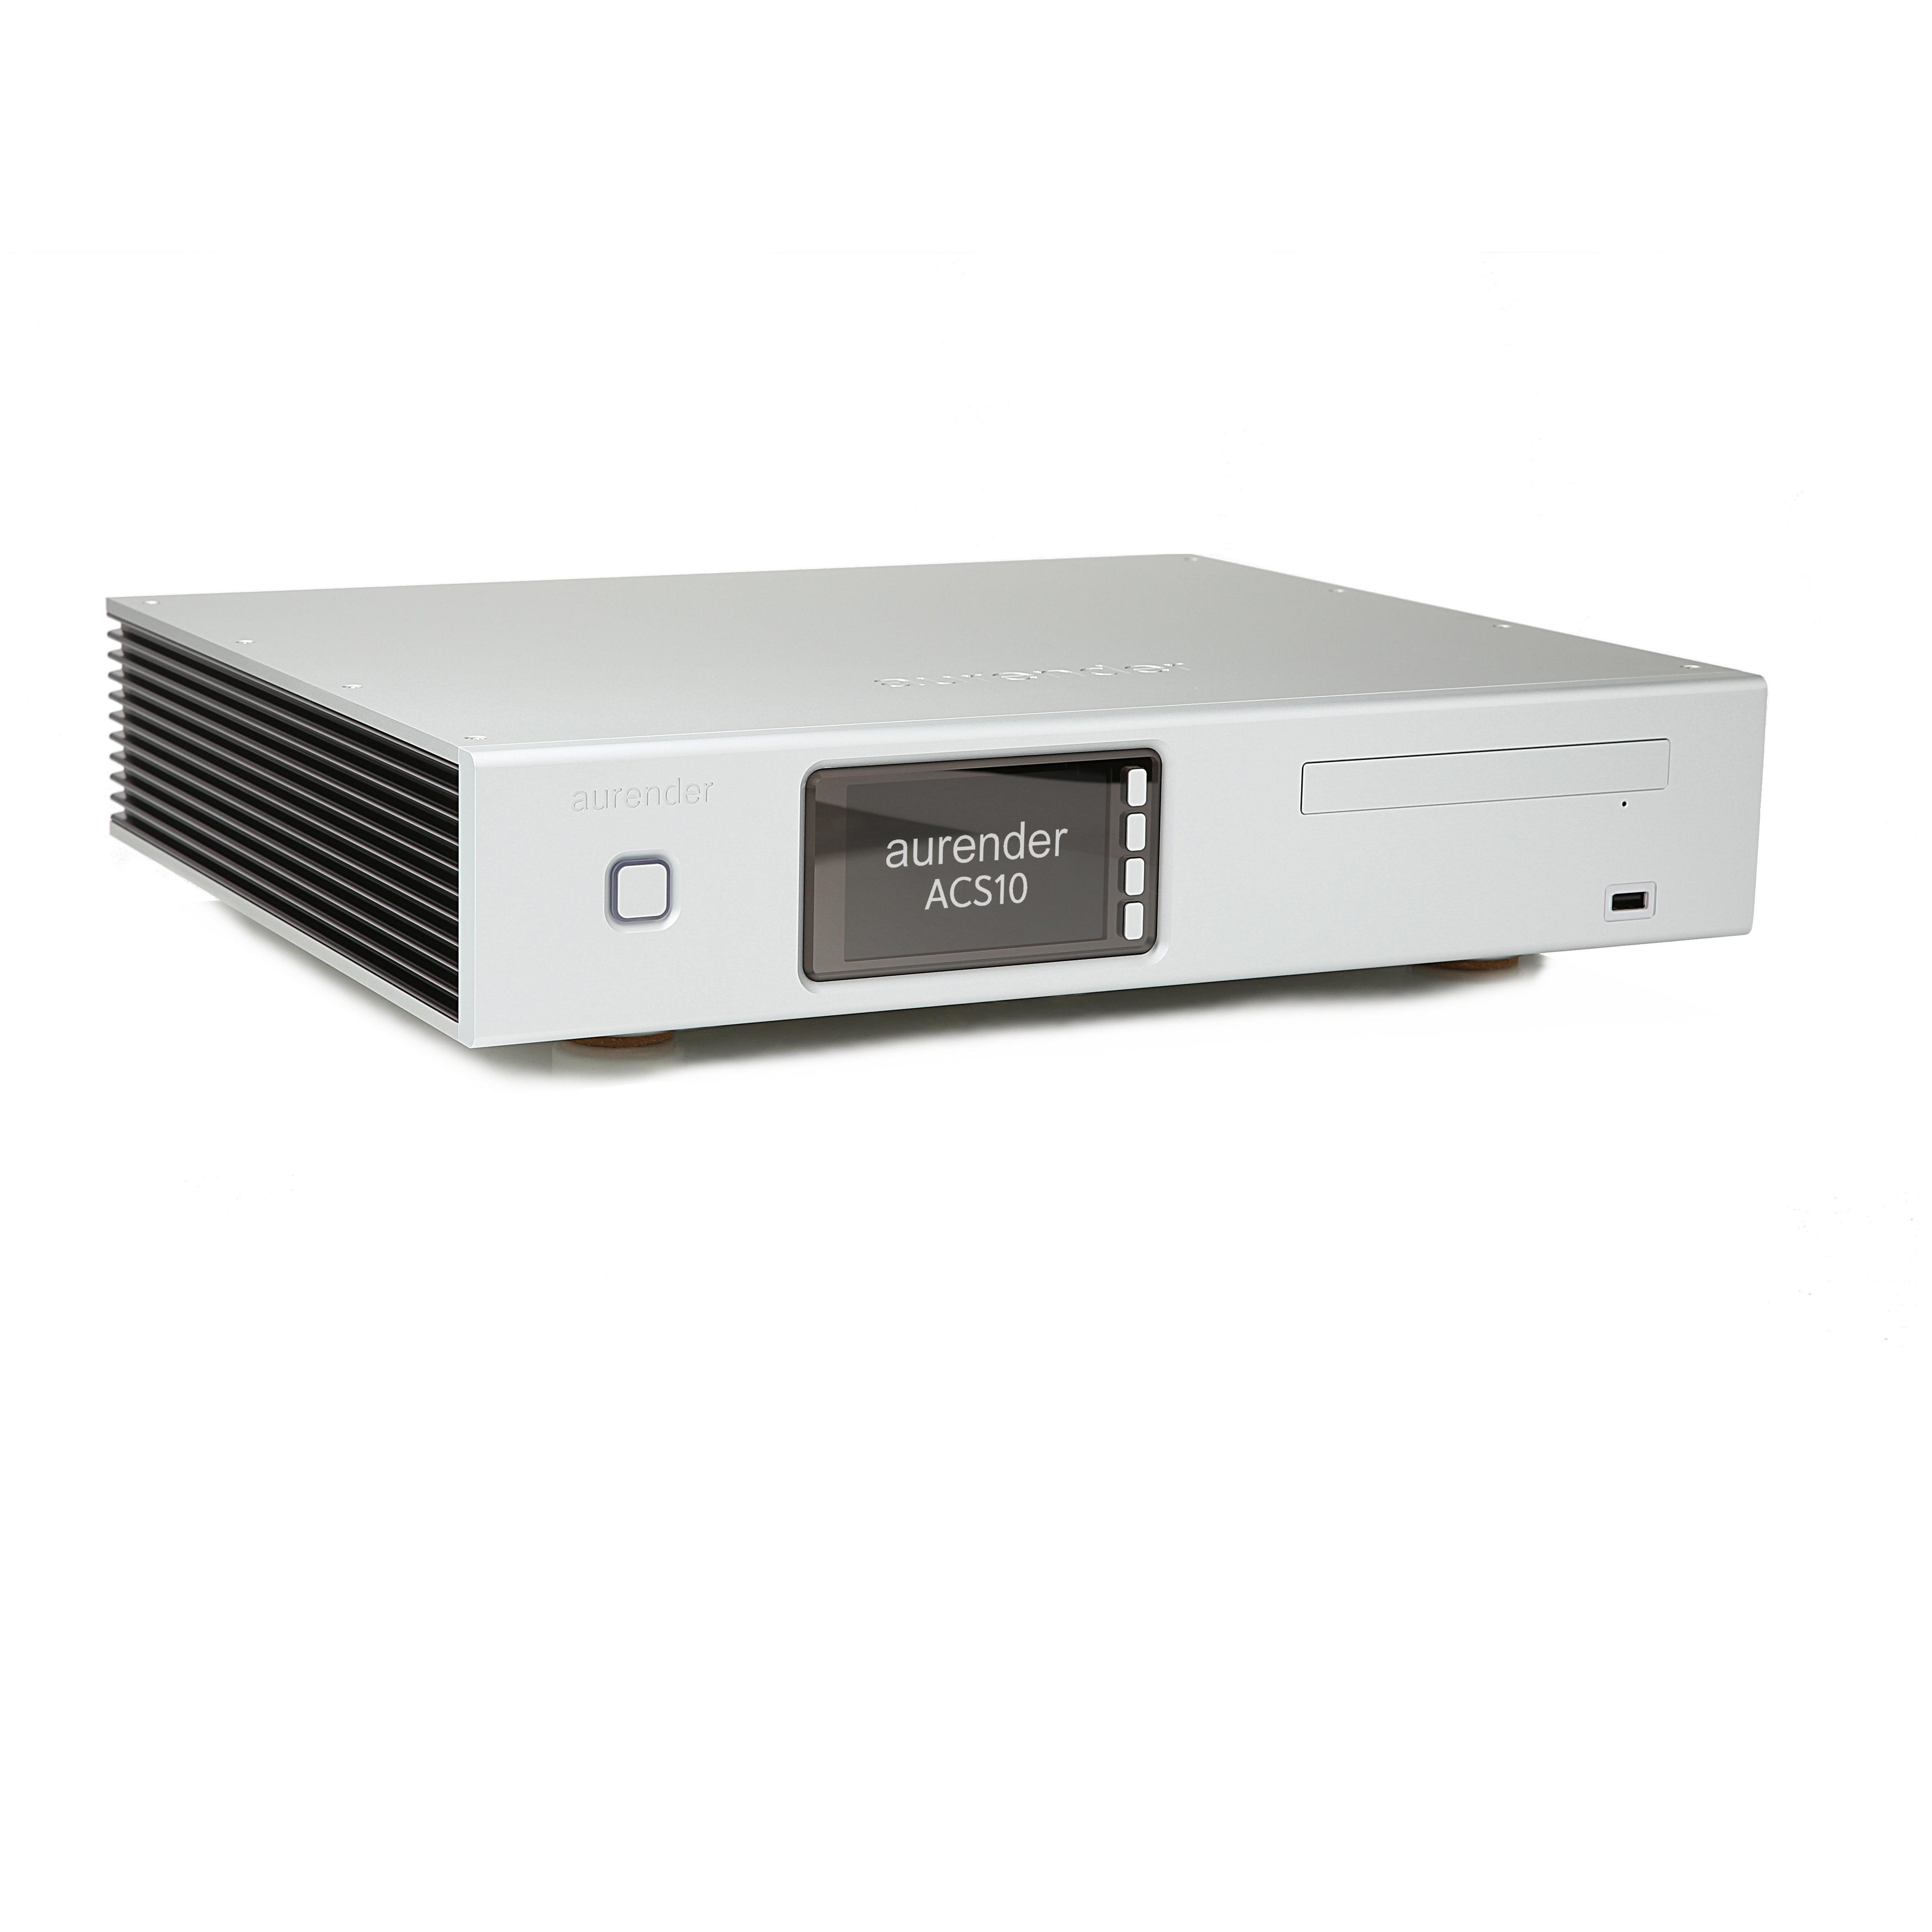 DEMO - Aurender ACS10-16TB Server / Streamer, Ripper and Backup, Silver